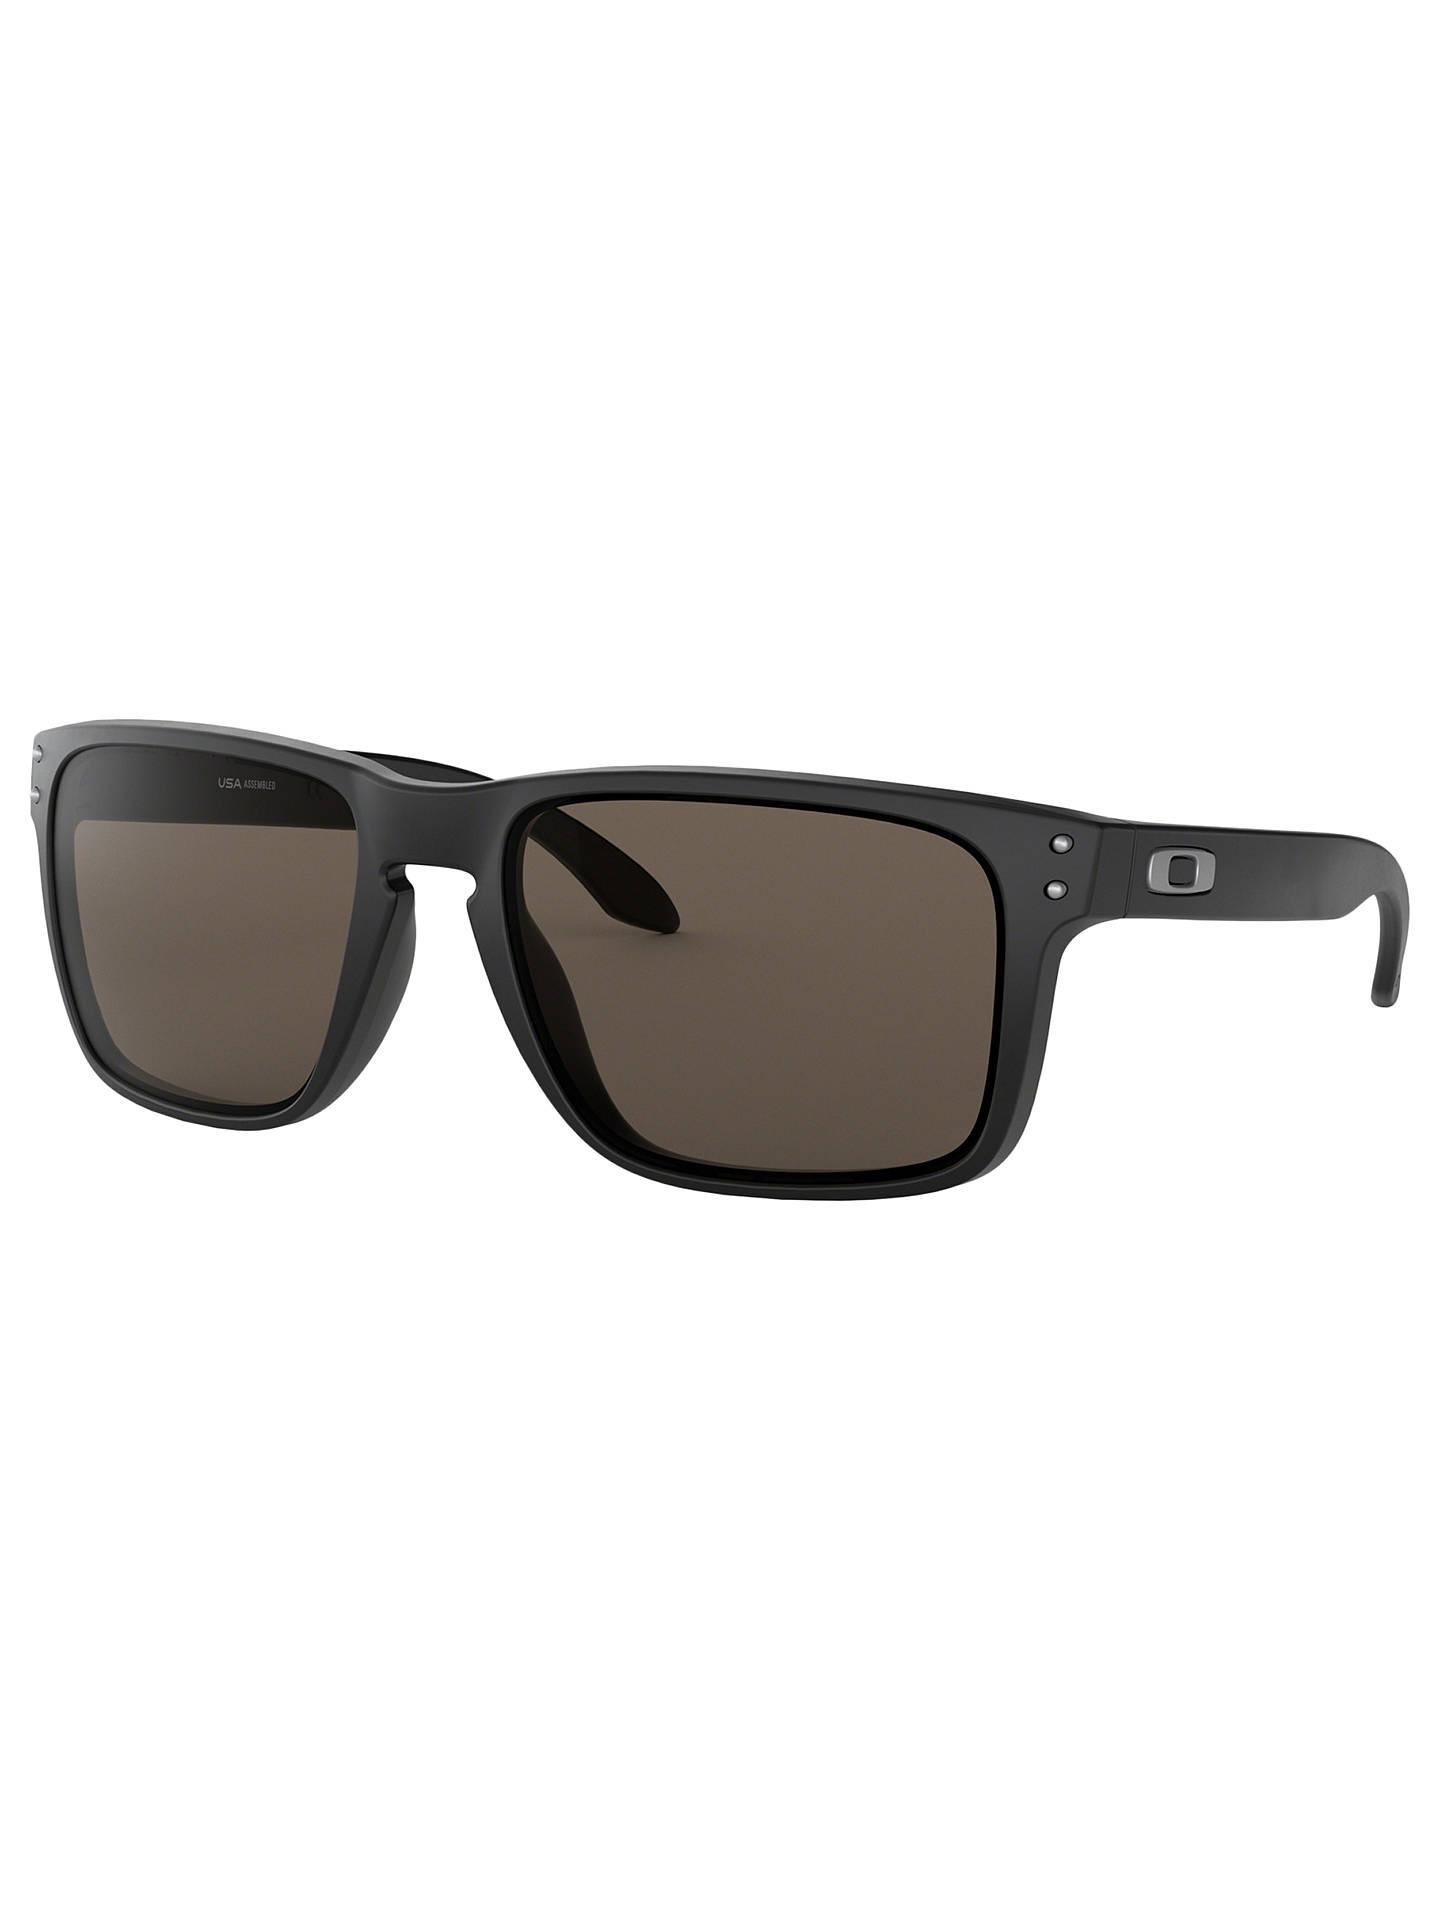 619c888815b Oakley OO9417 Men s Holbrook XL Square Sunglasses at John Lewis ...